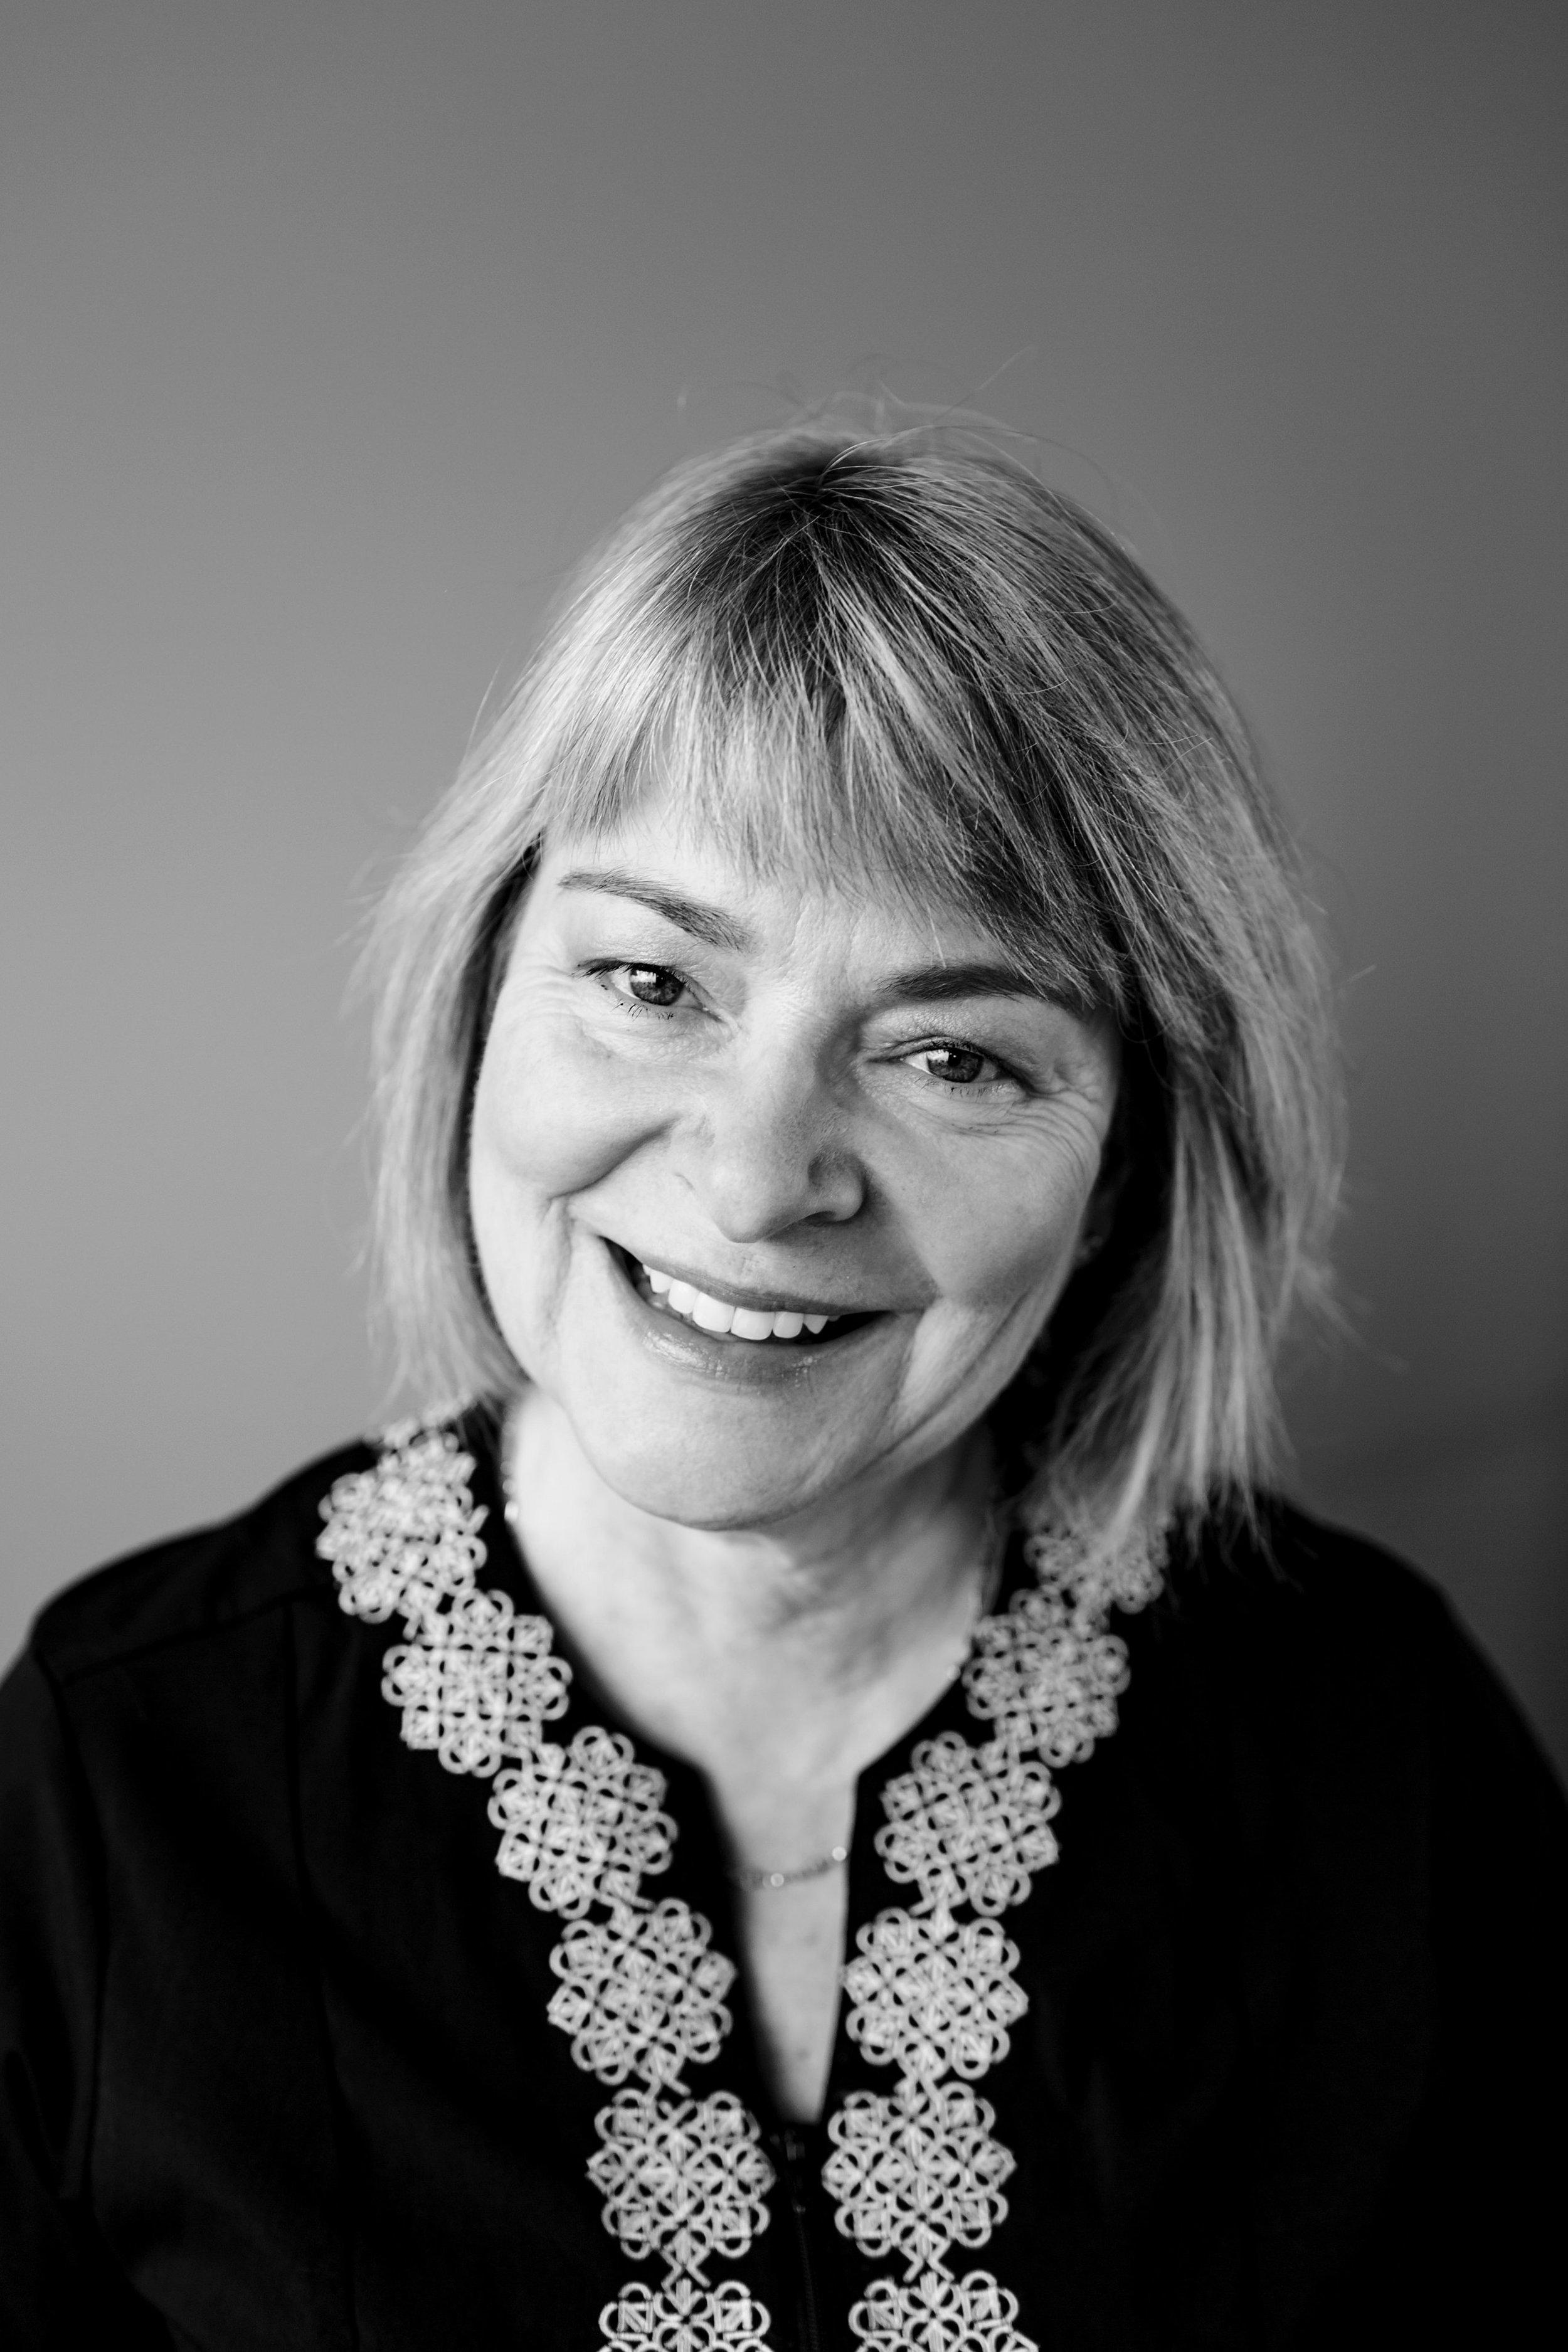 Jennifer Monk - Administrative Assistant